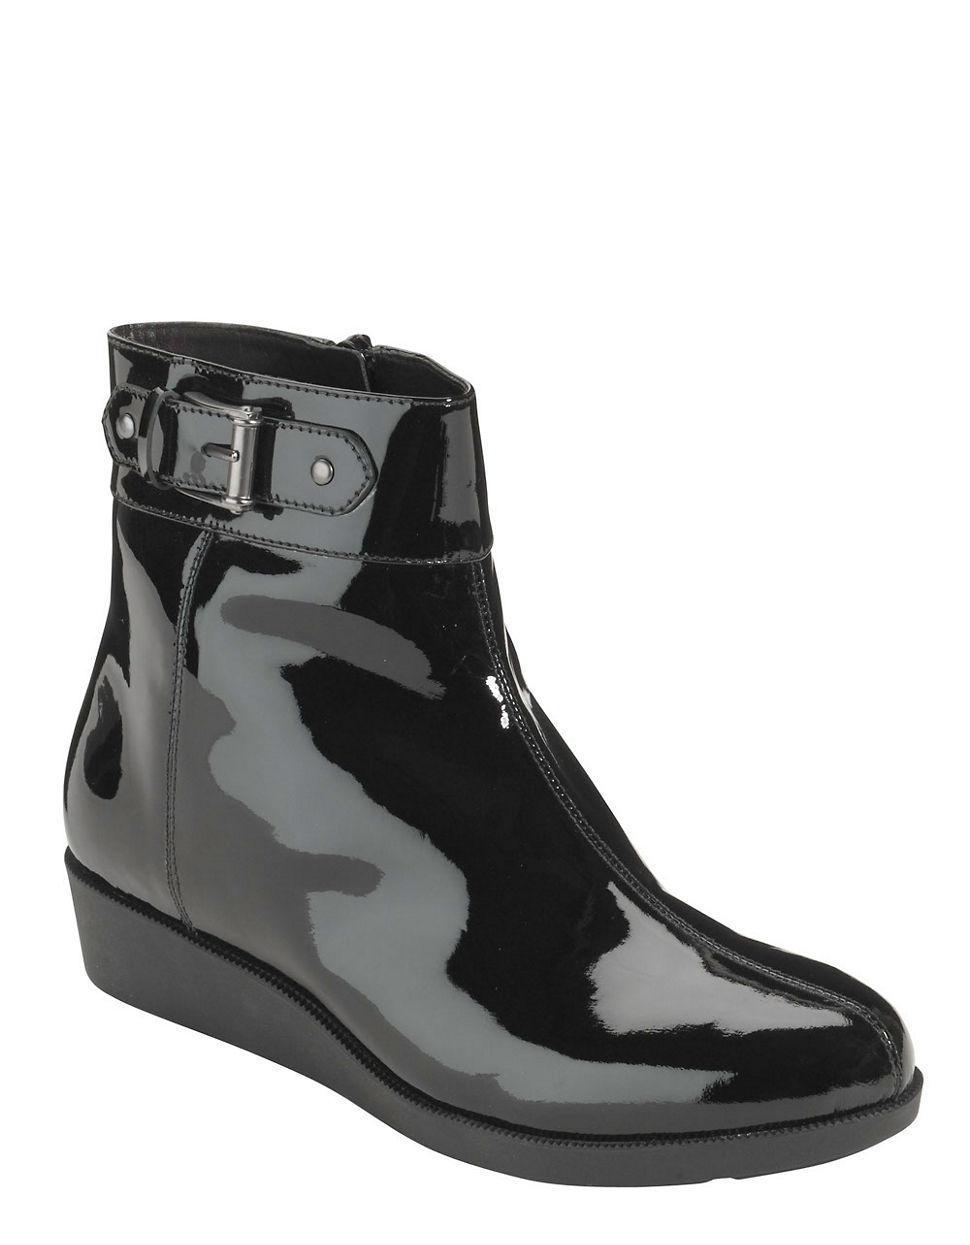 Cole Haan Air Tali Short Patent Leather Rain Bootsair Tali